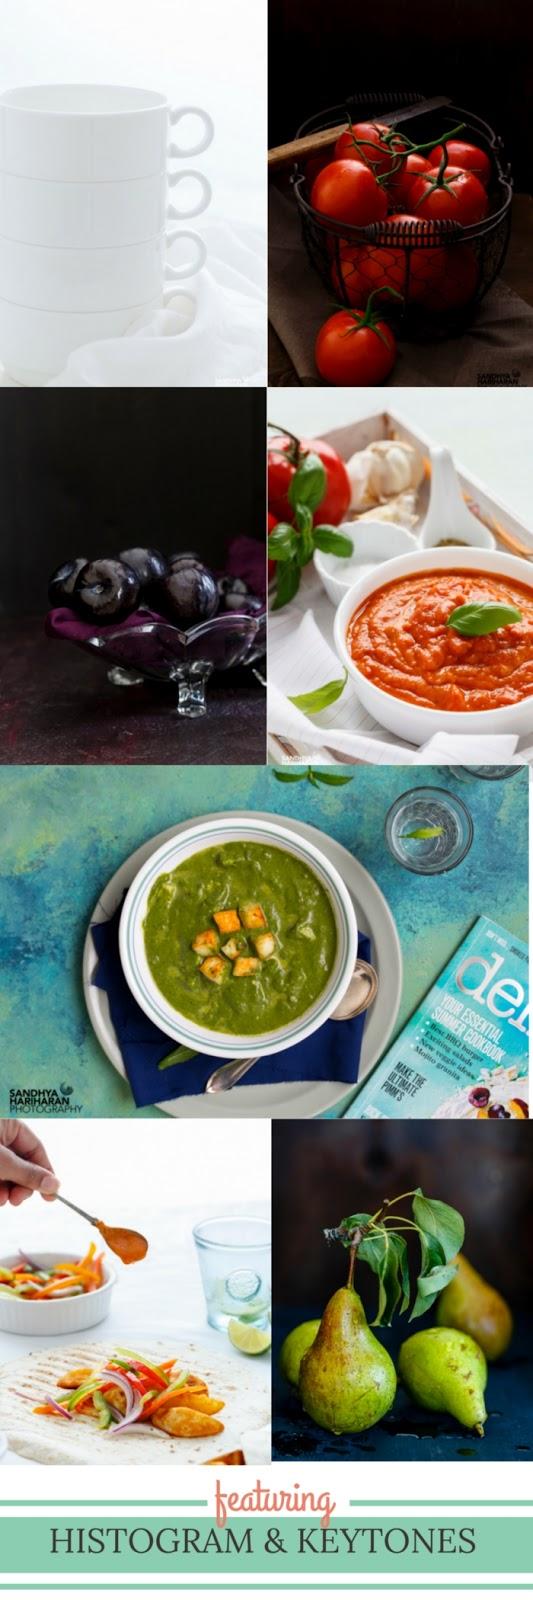 Food Photography – Histogram & Key Tones